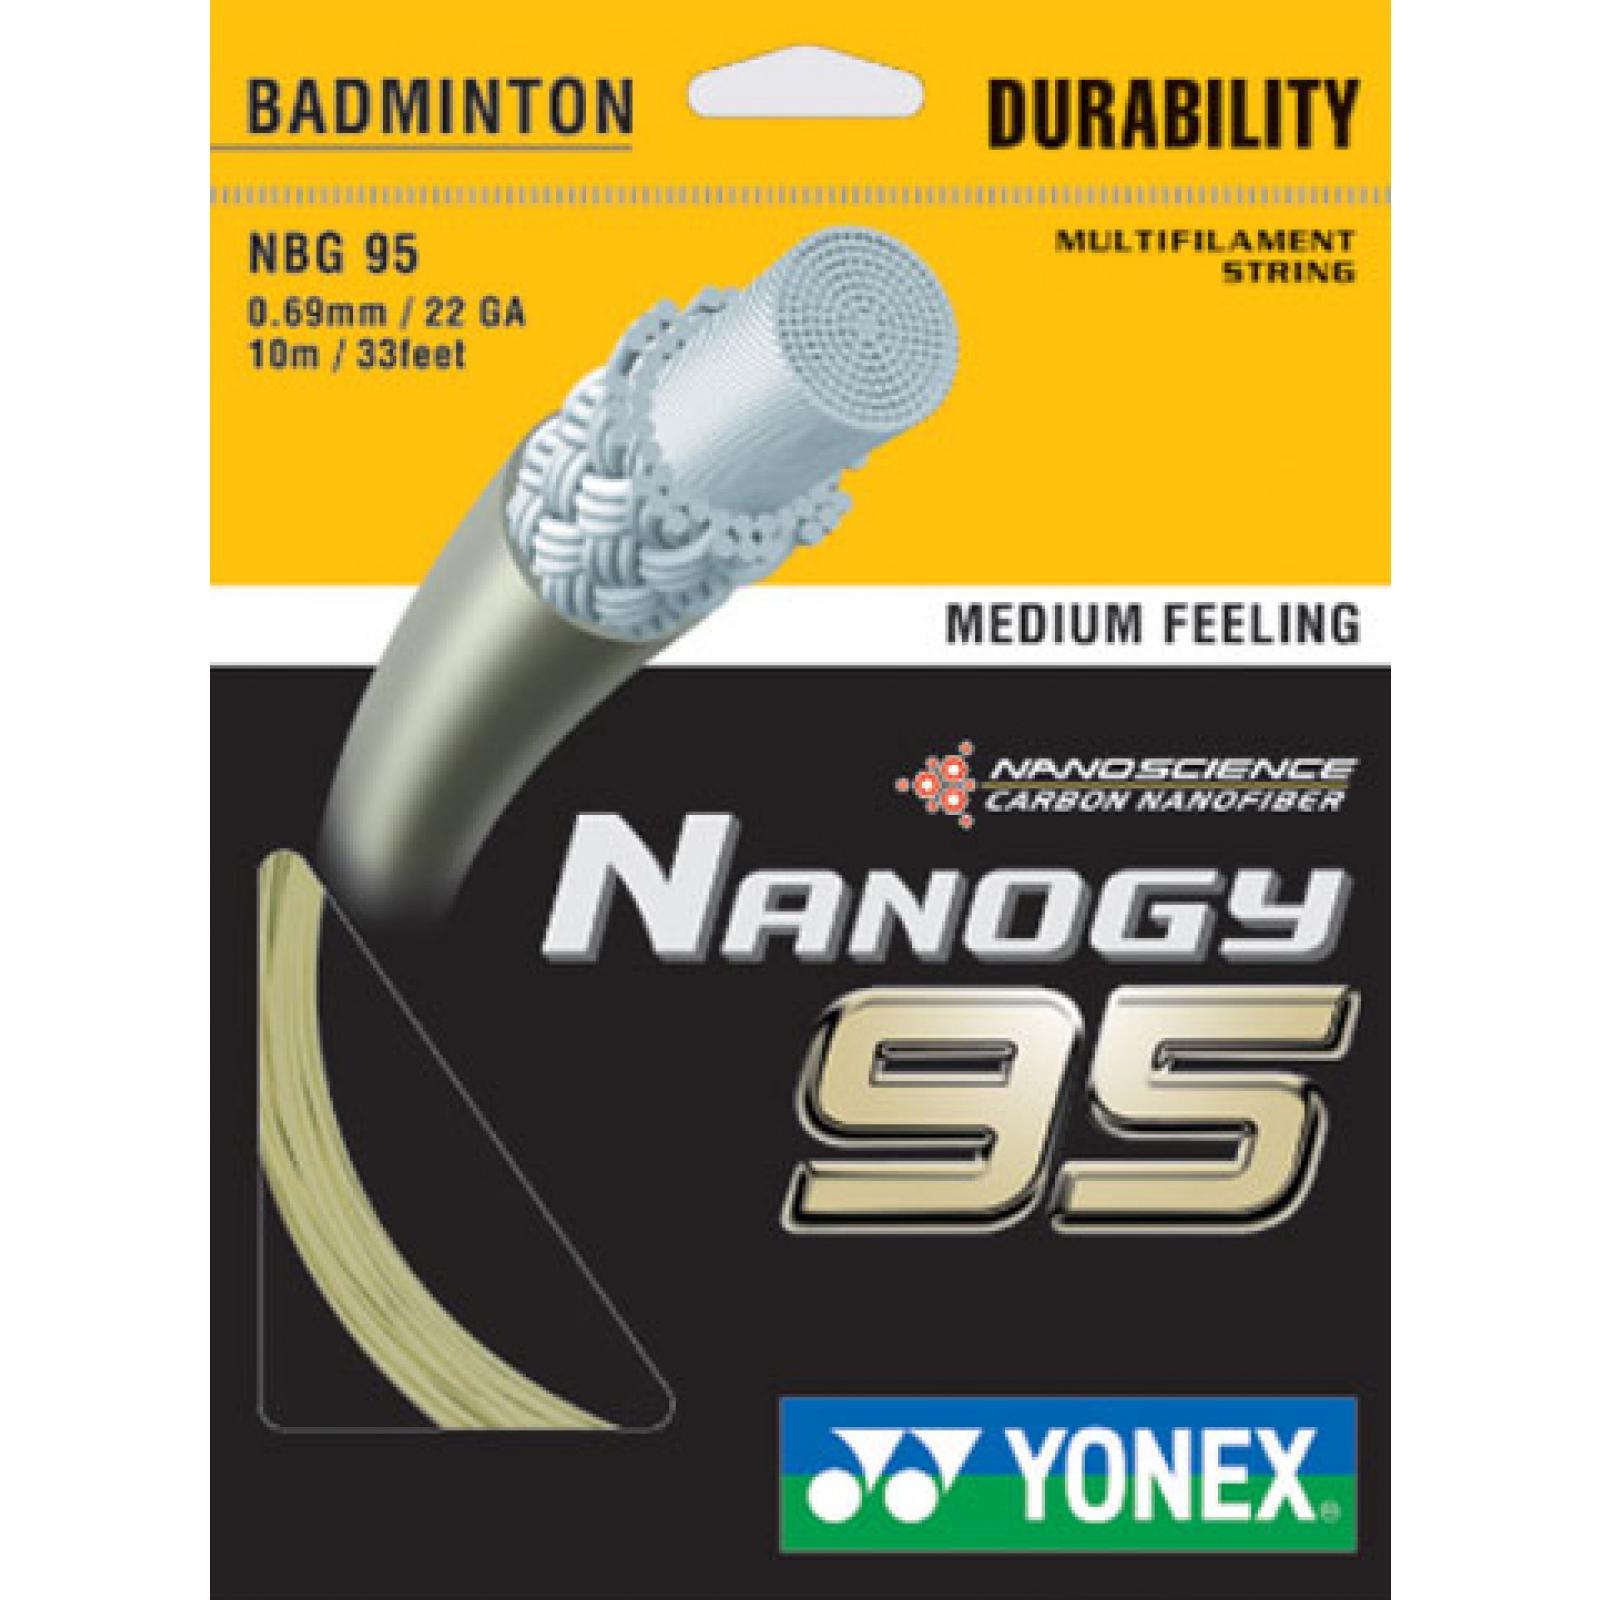 https://www.badec.store/produkty_img/badmintonovy-vyplet1571925409L.jpg